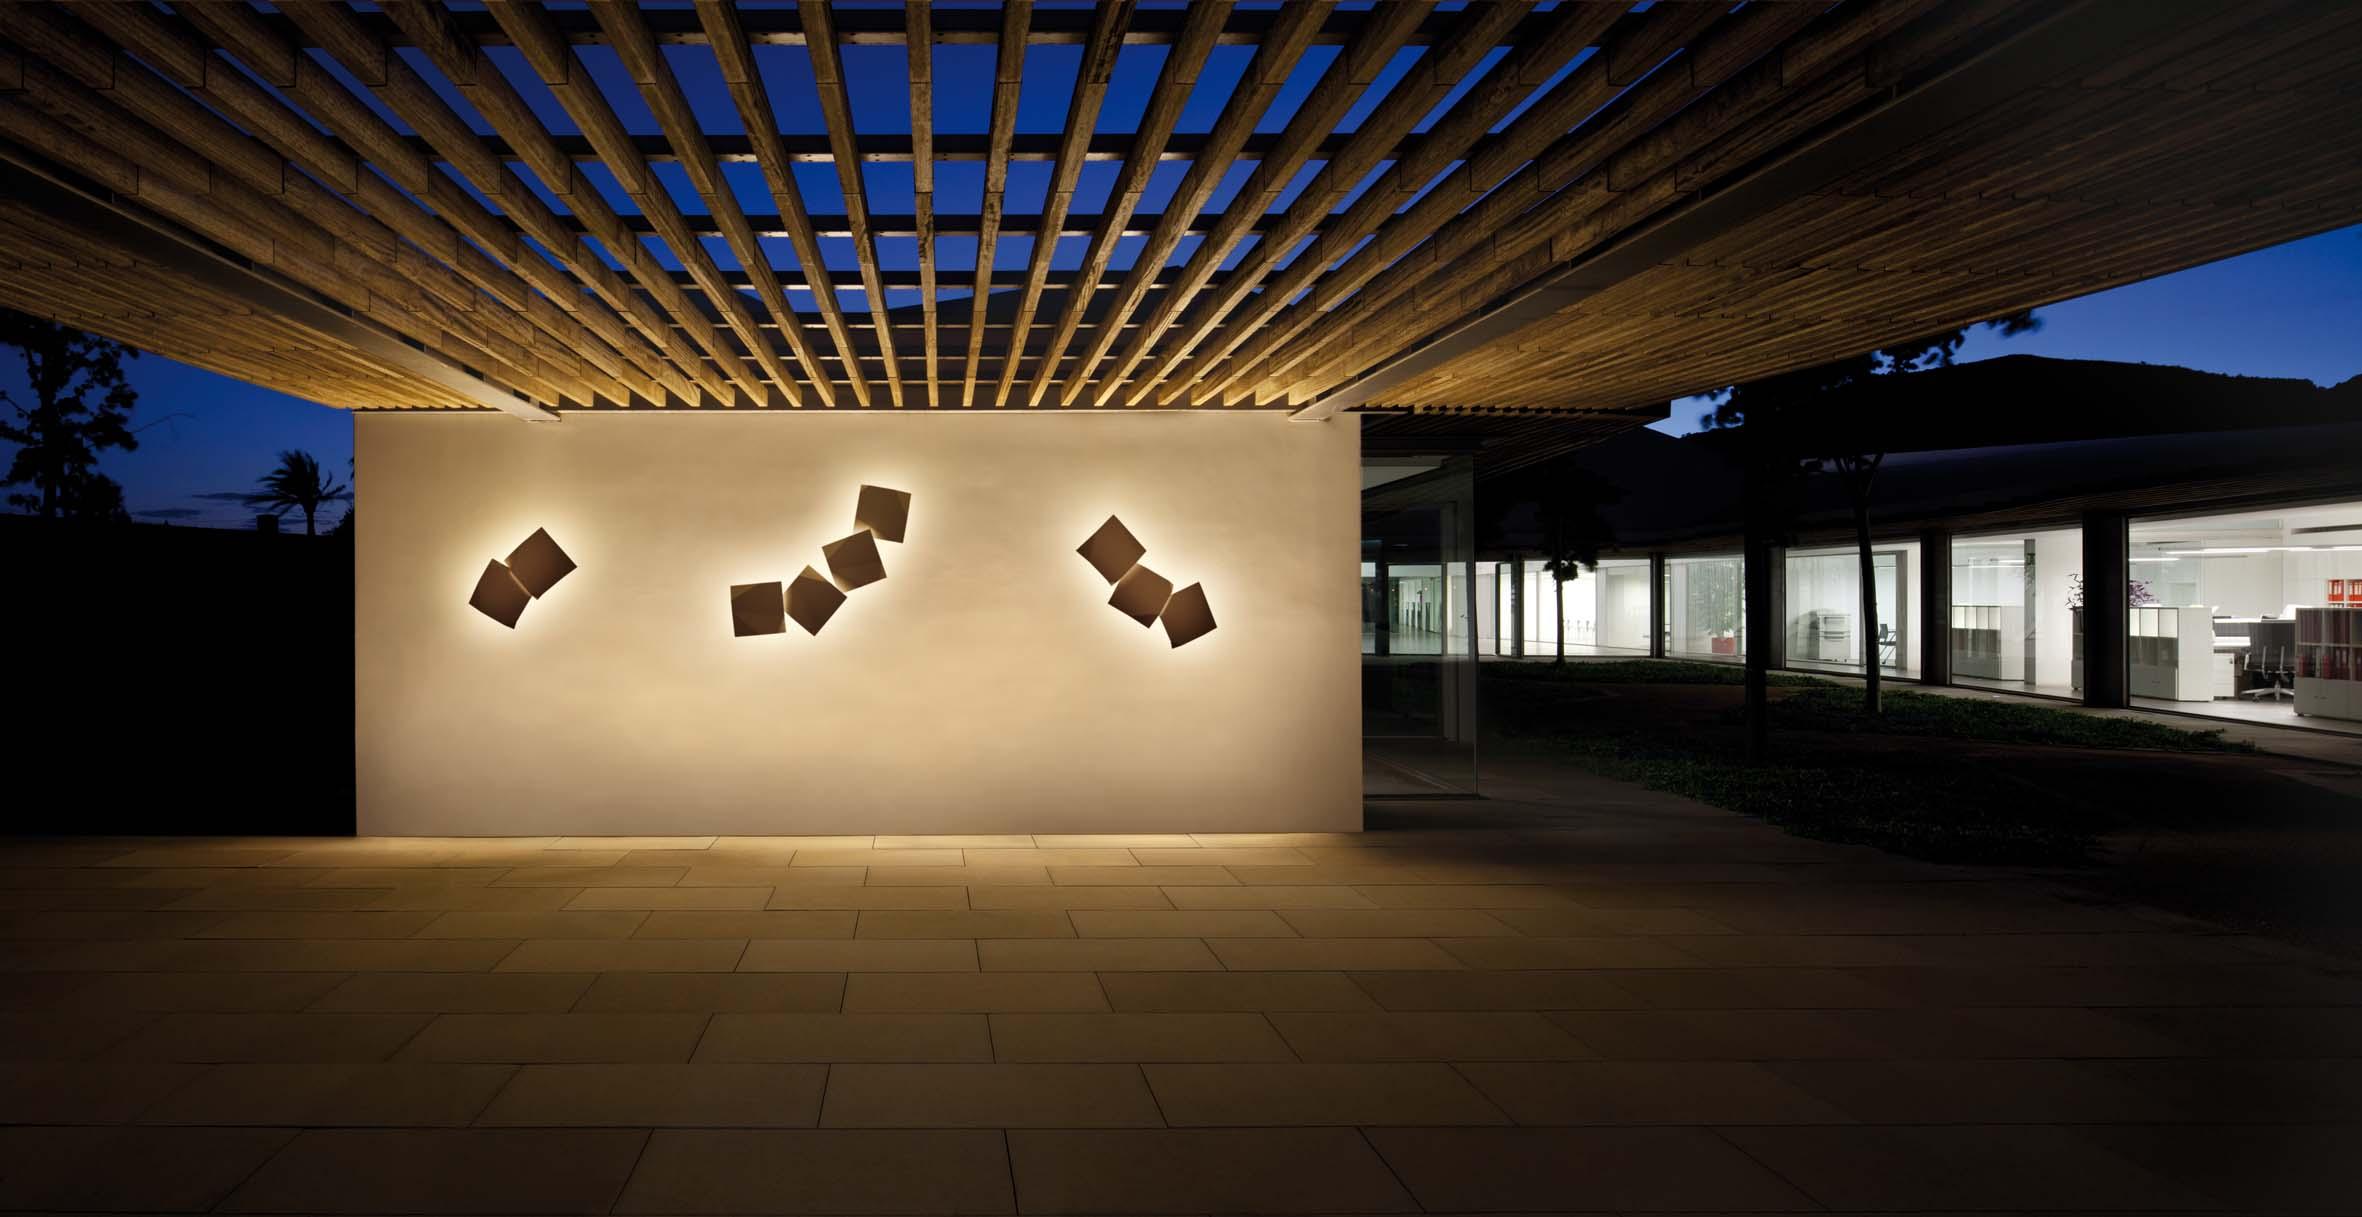 Iluminaci n de dise o decorativa y moderna gunni trentino for Lamparas para iluminacion exterior